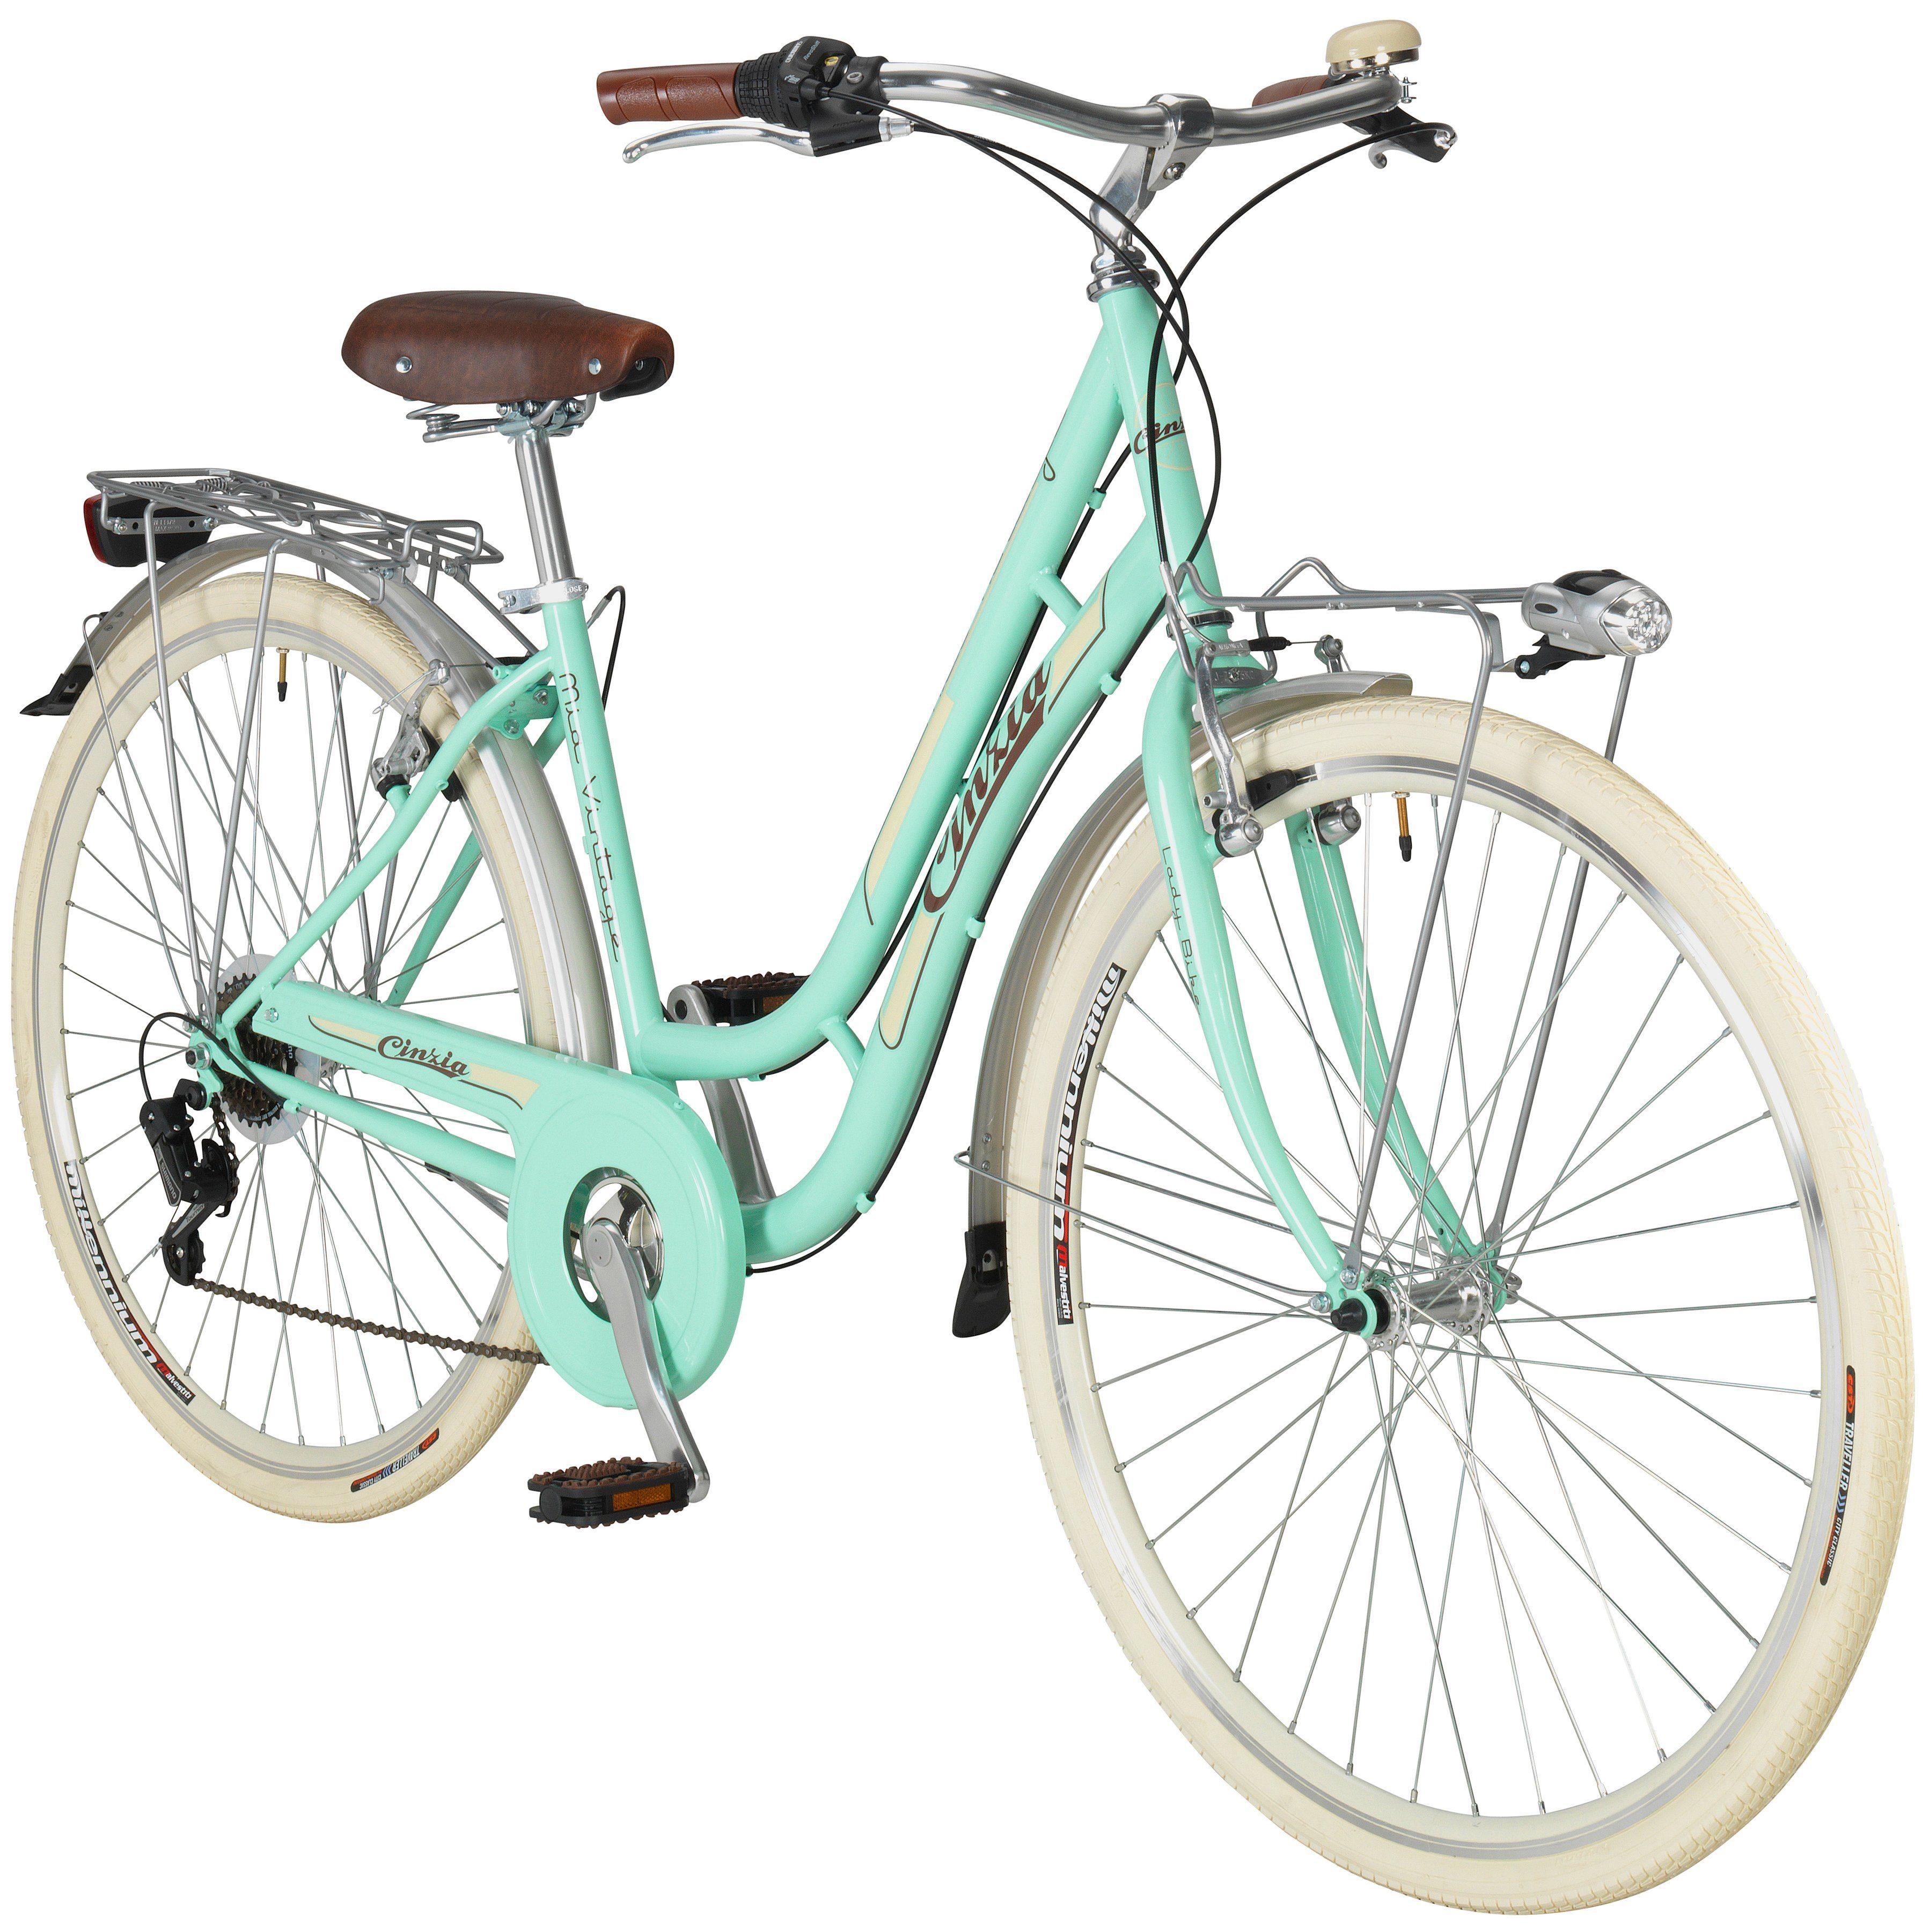 Citybike Damen »Mia«, 28 Zoll, 6 Gang, Felgenbremse